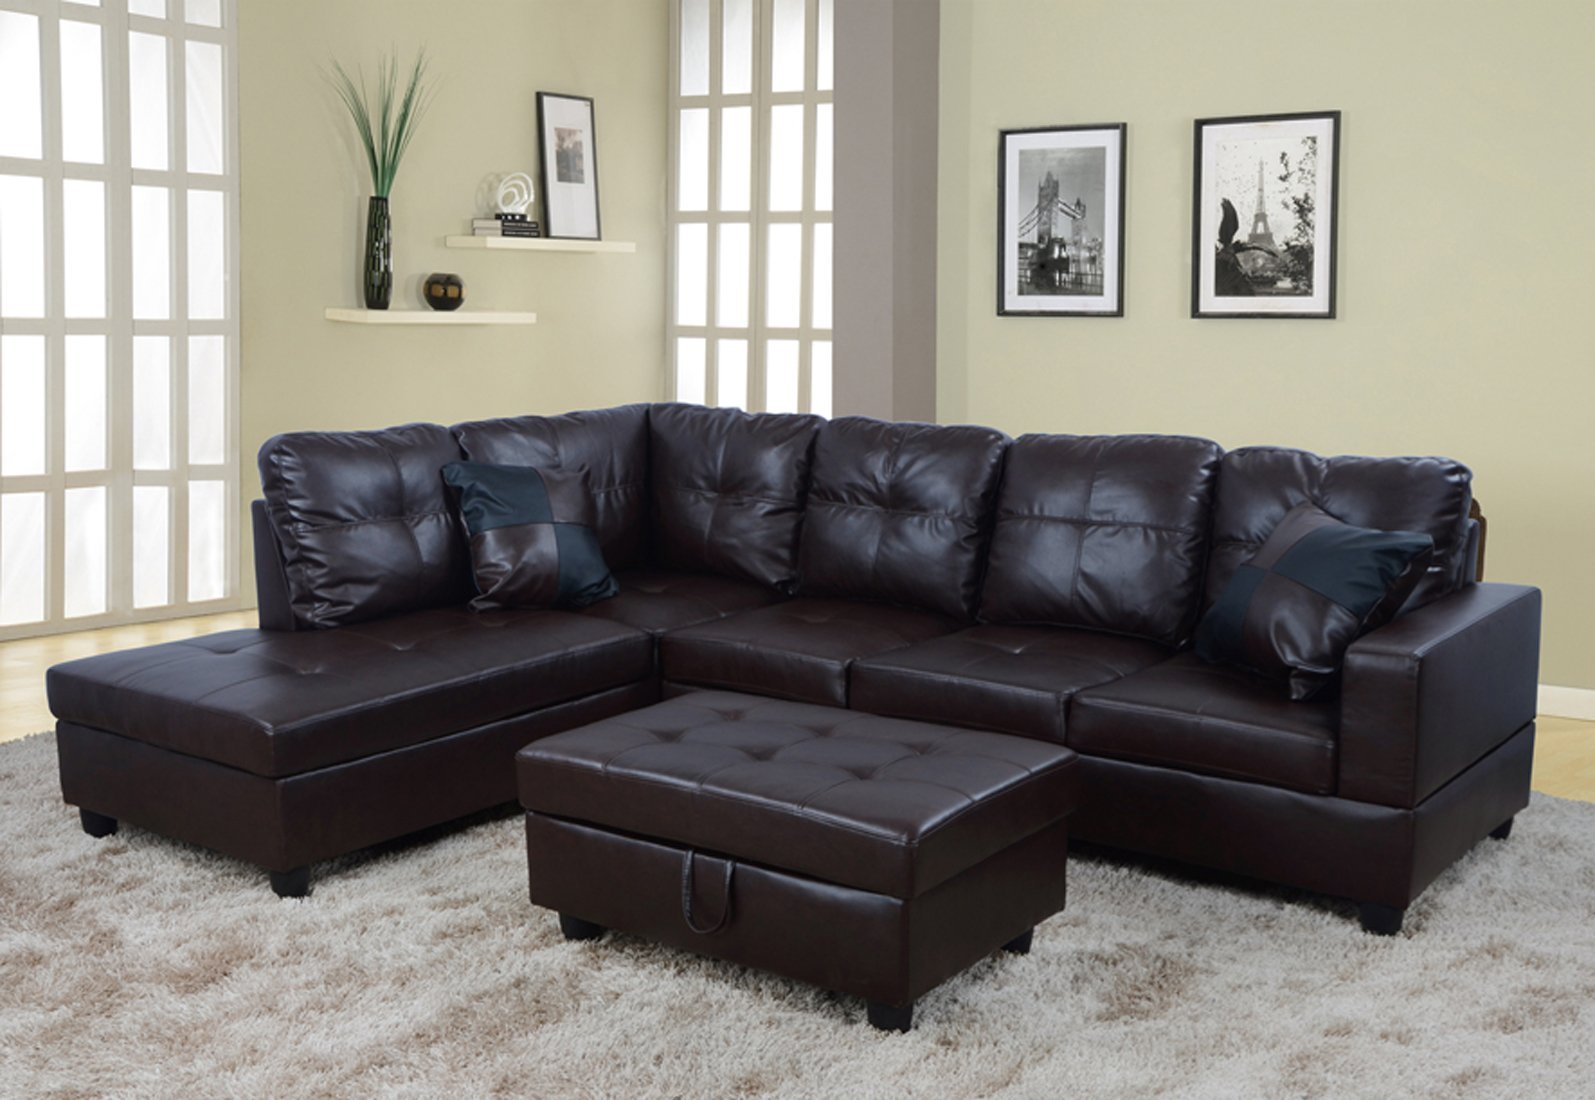 Amazing Buy Lifestyle Faux Leather Left Facing Sectional Sofa Set Spiritservingveterans Wood Chair Design Ideas Spiritservingveteransorg